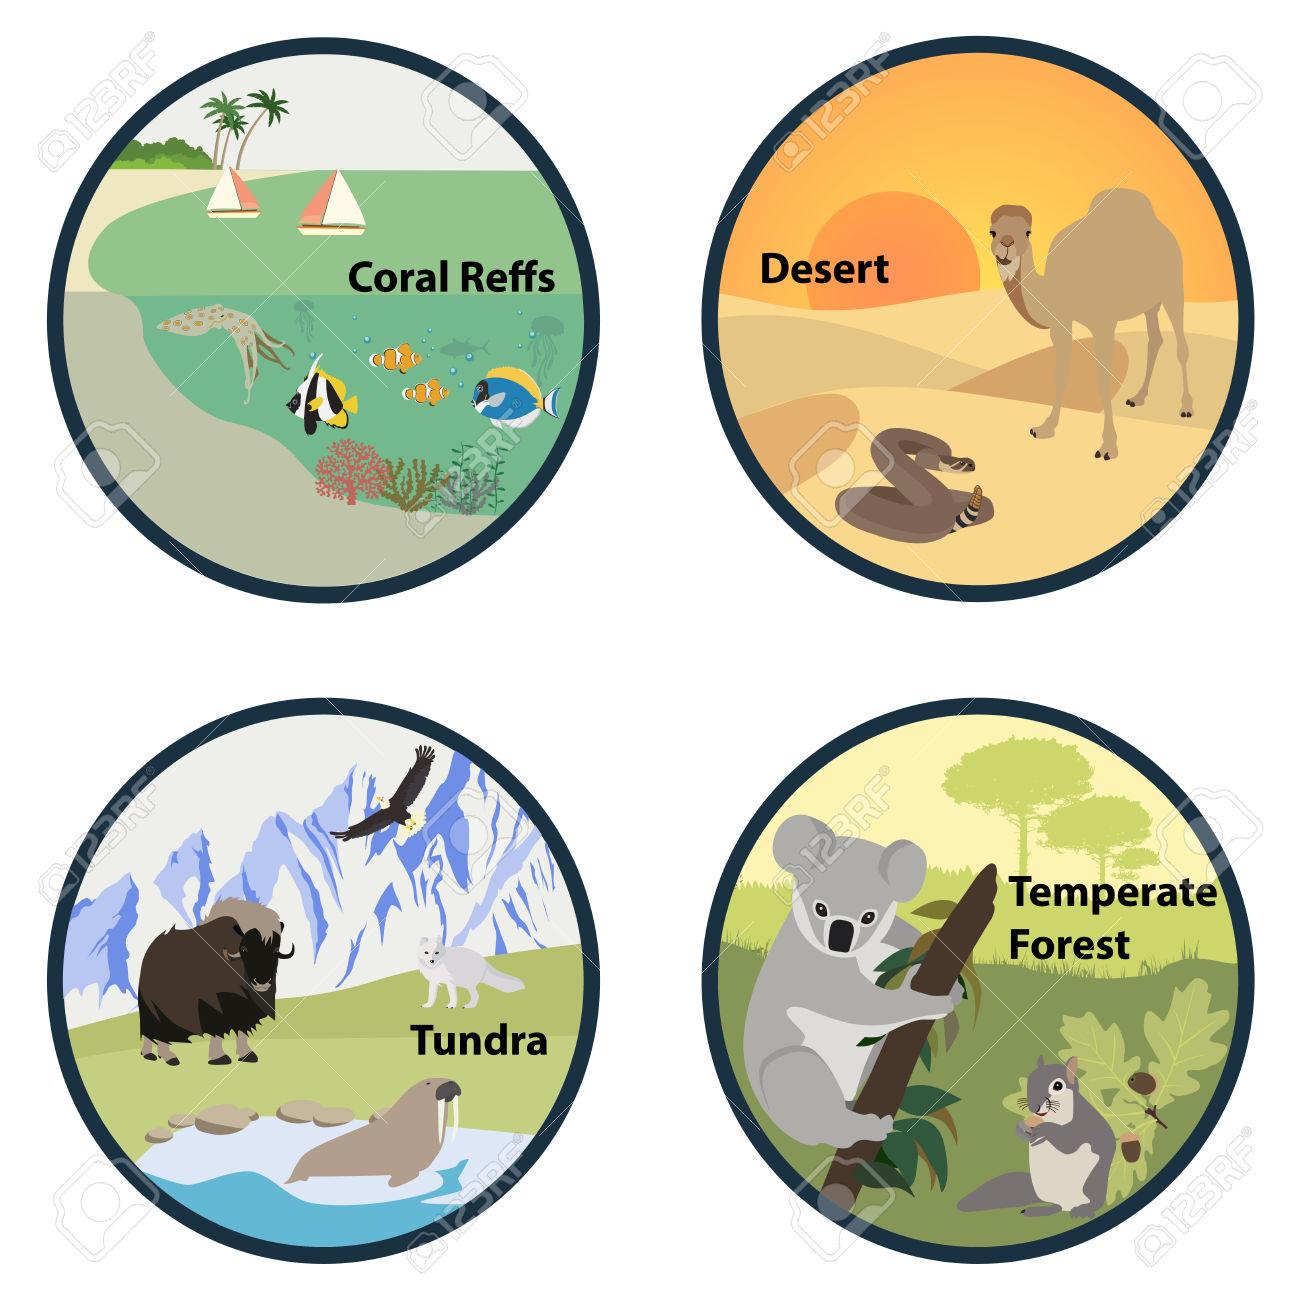 Desert clipart forest habitat. Cliparts free download best